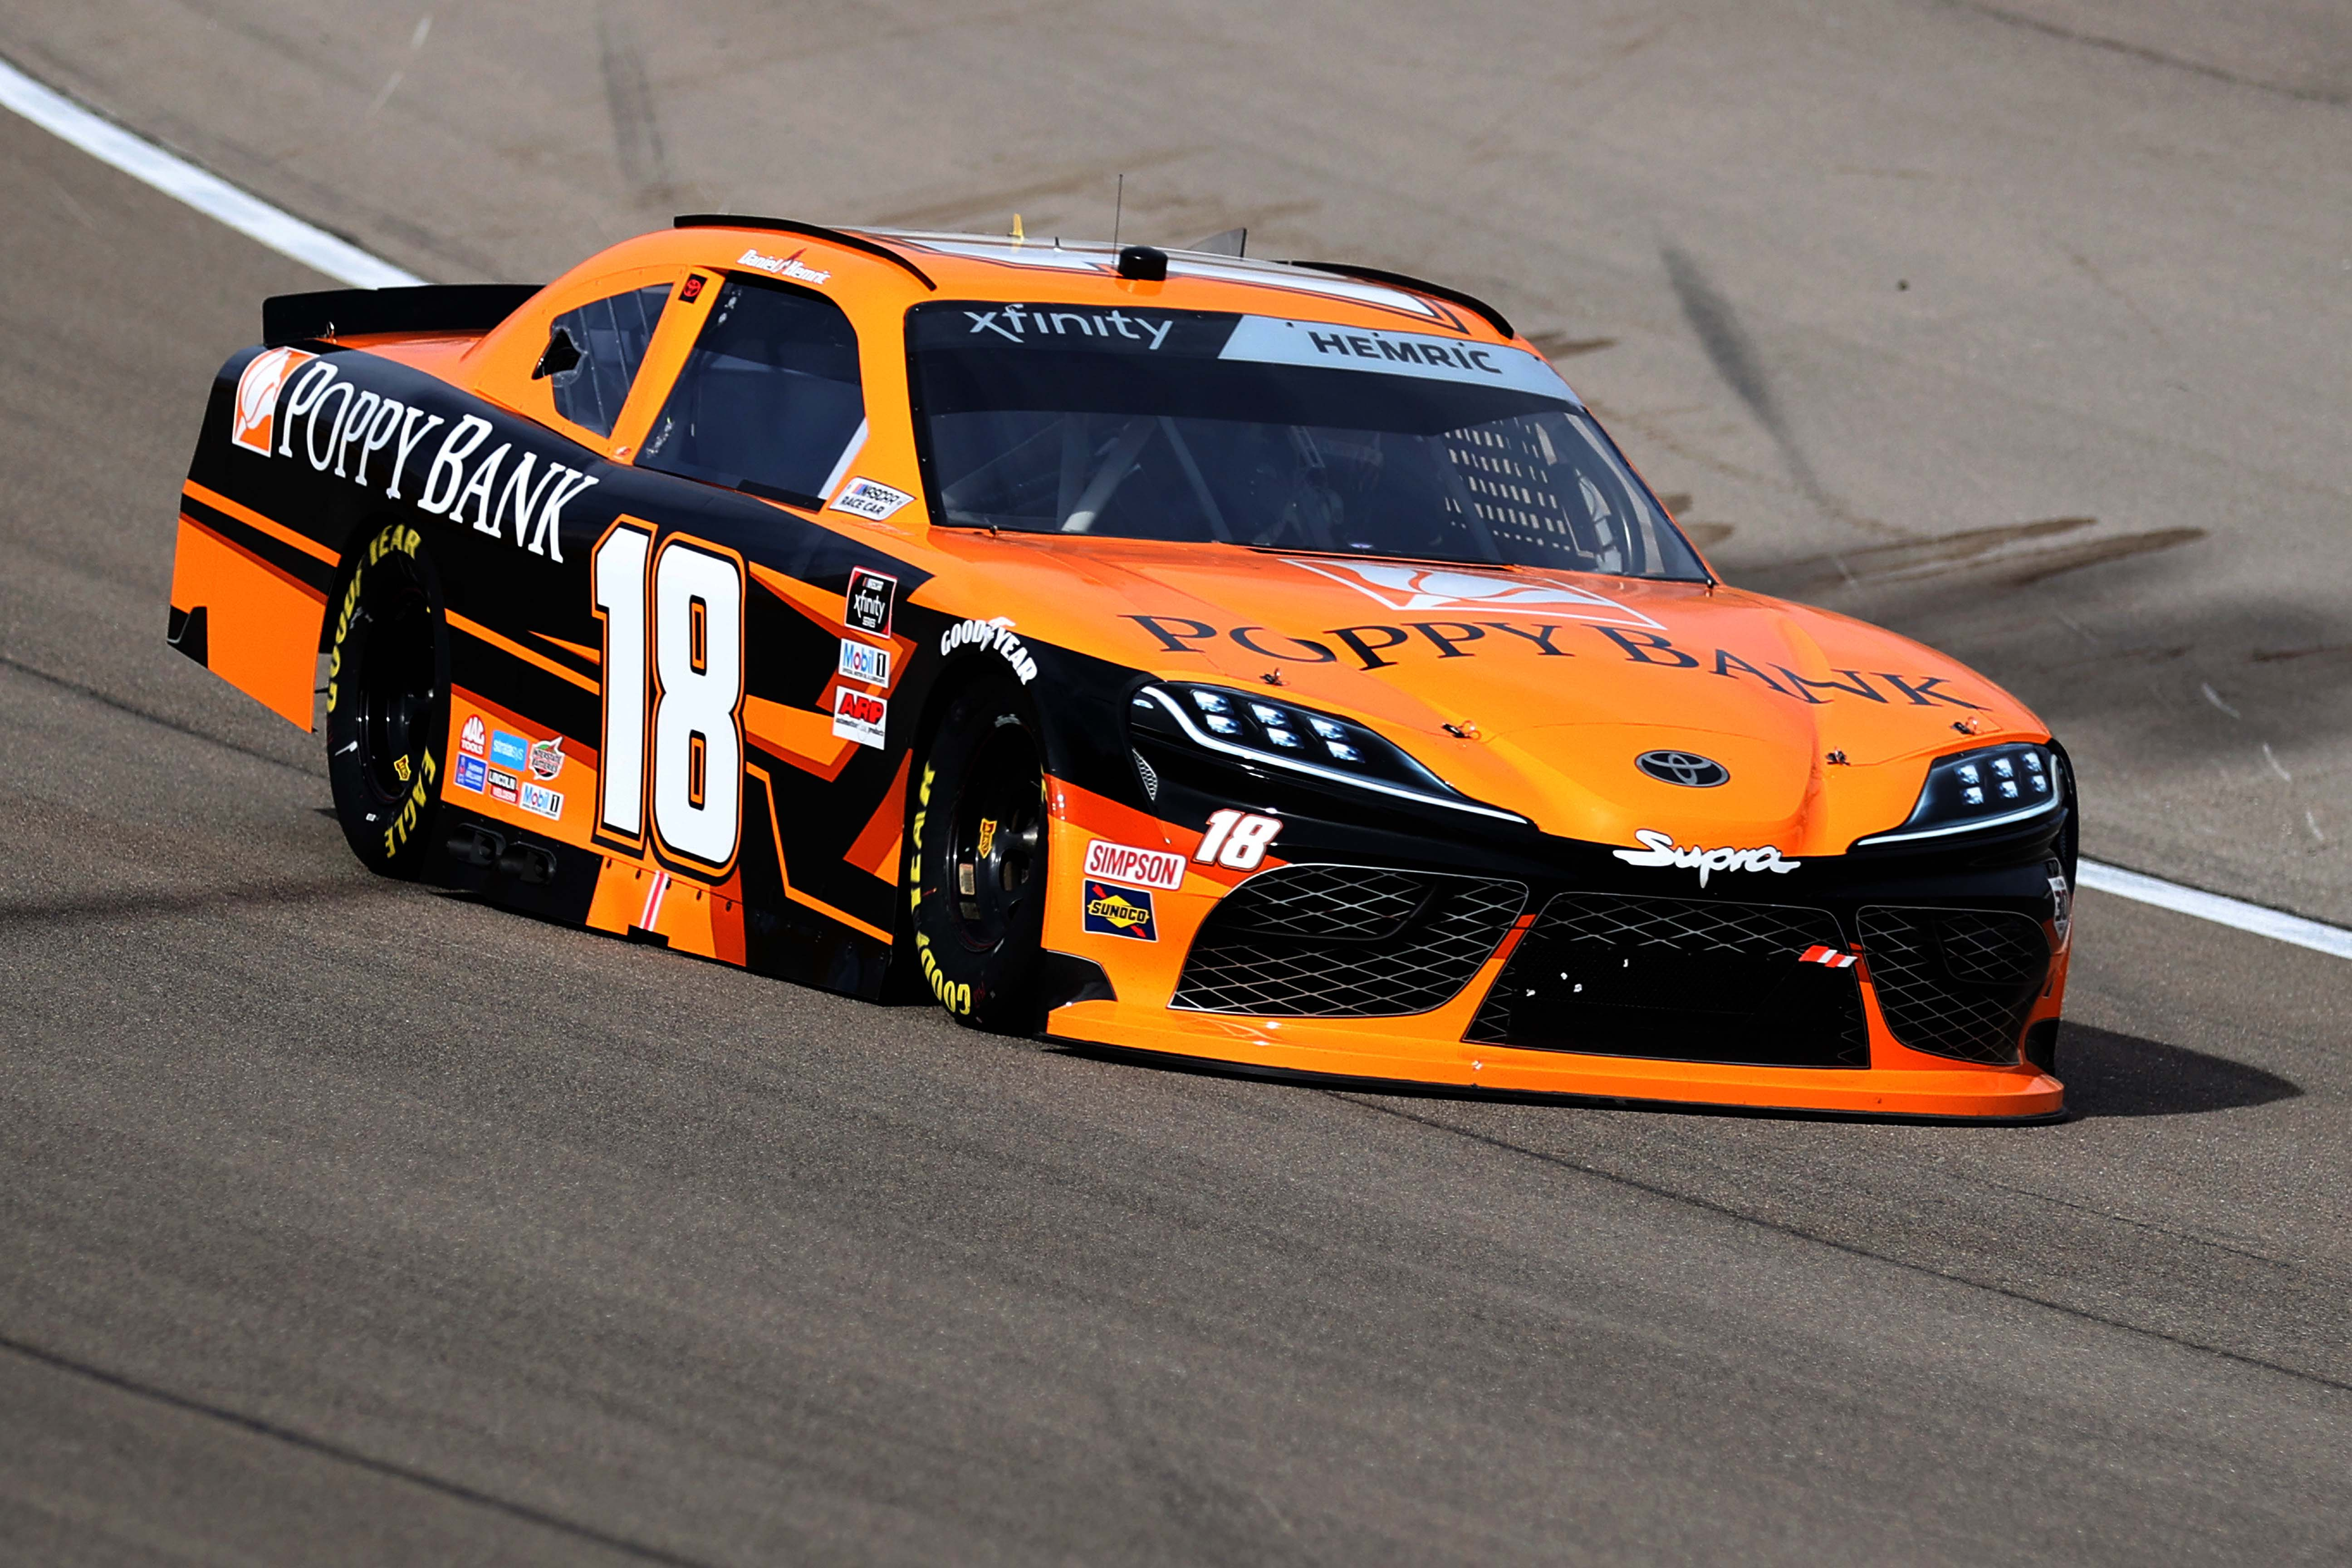 Daniel Hemric at Las Vegas Motor Speedway - NASCAR Xfinity Series